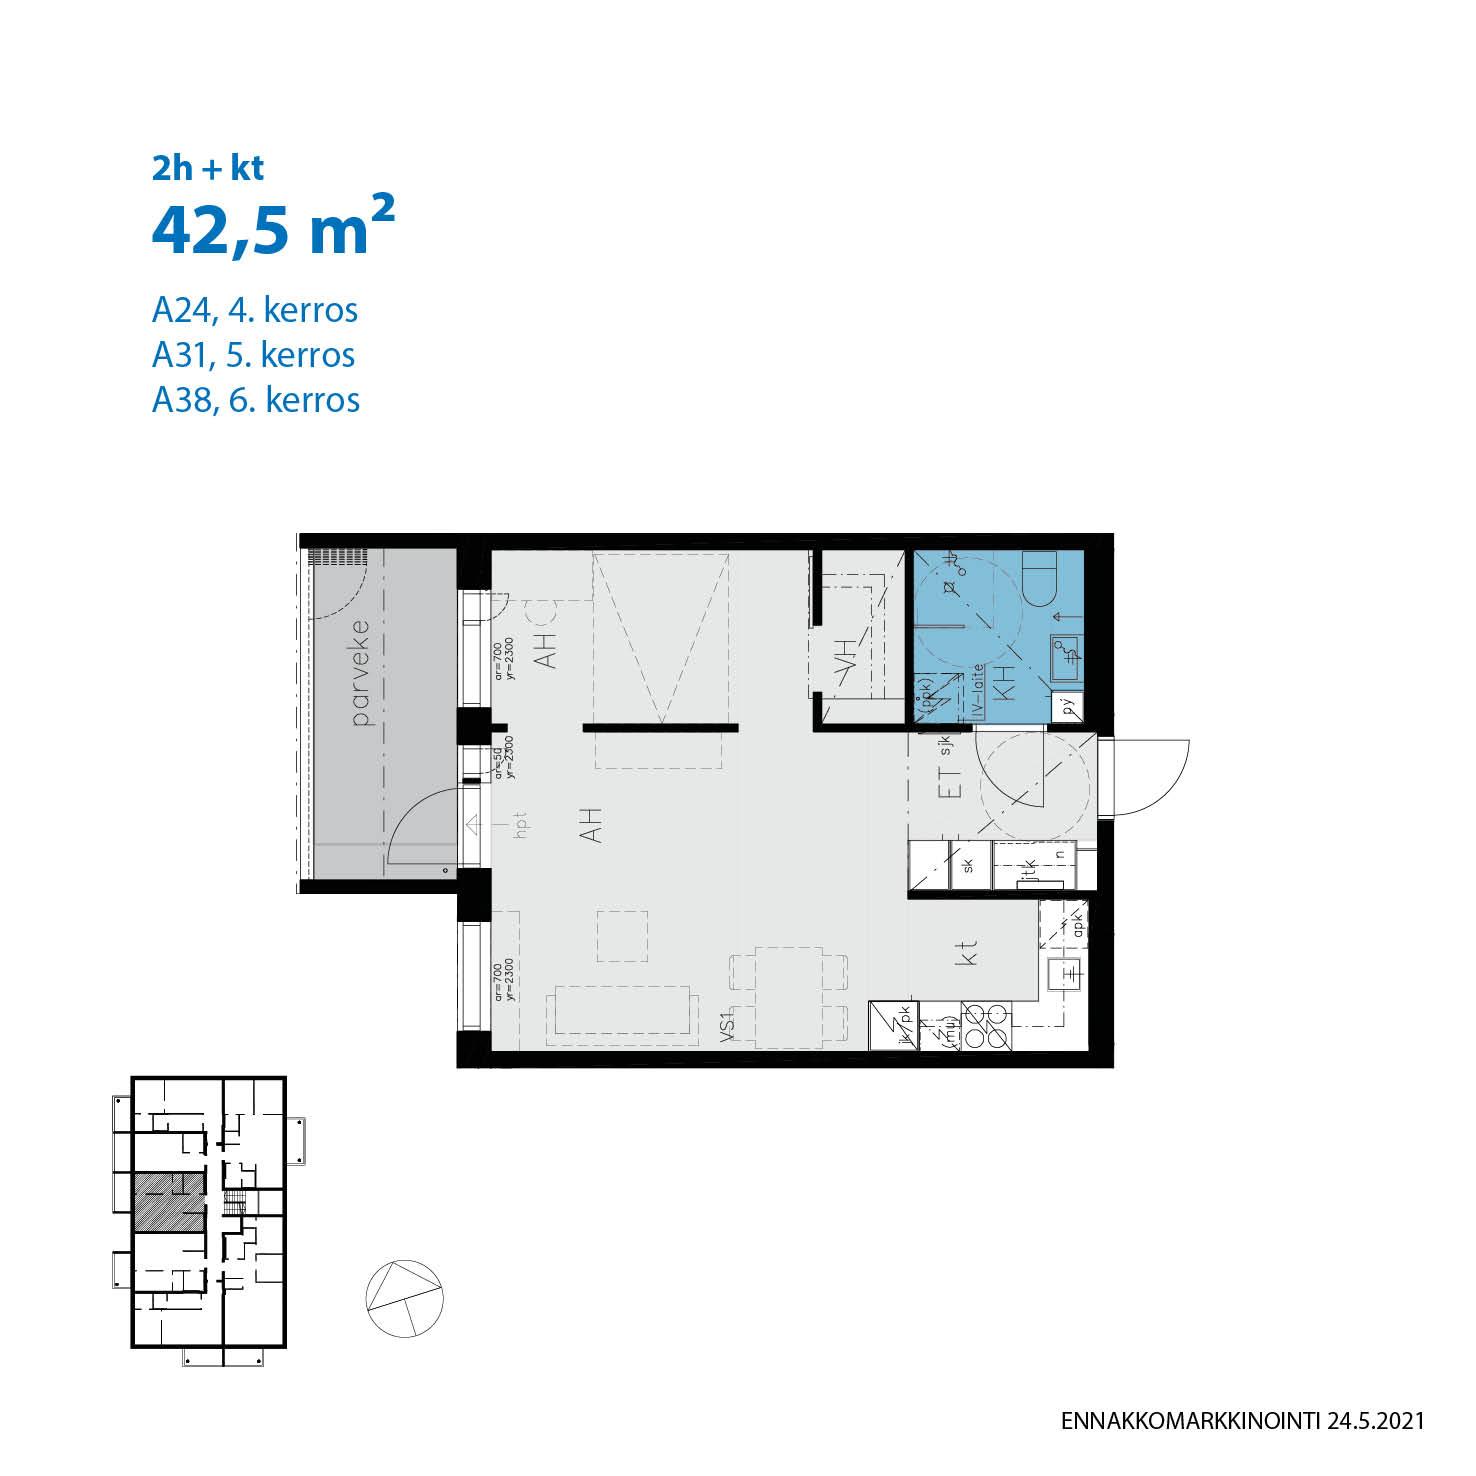 A24, 42.5 m<sup>2</sup>, 2h+kt